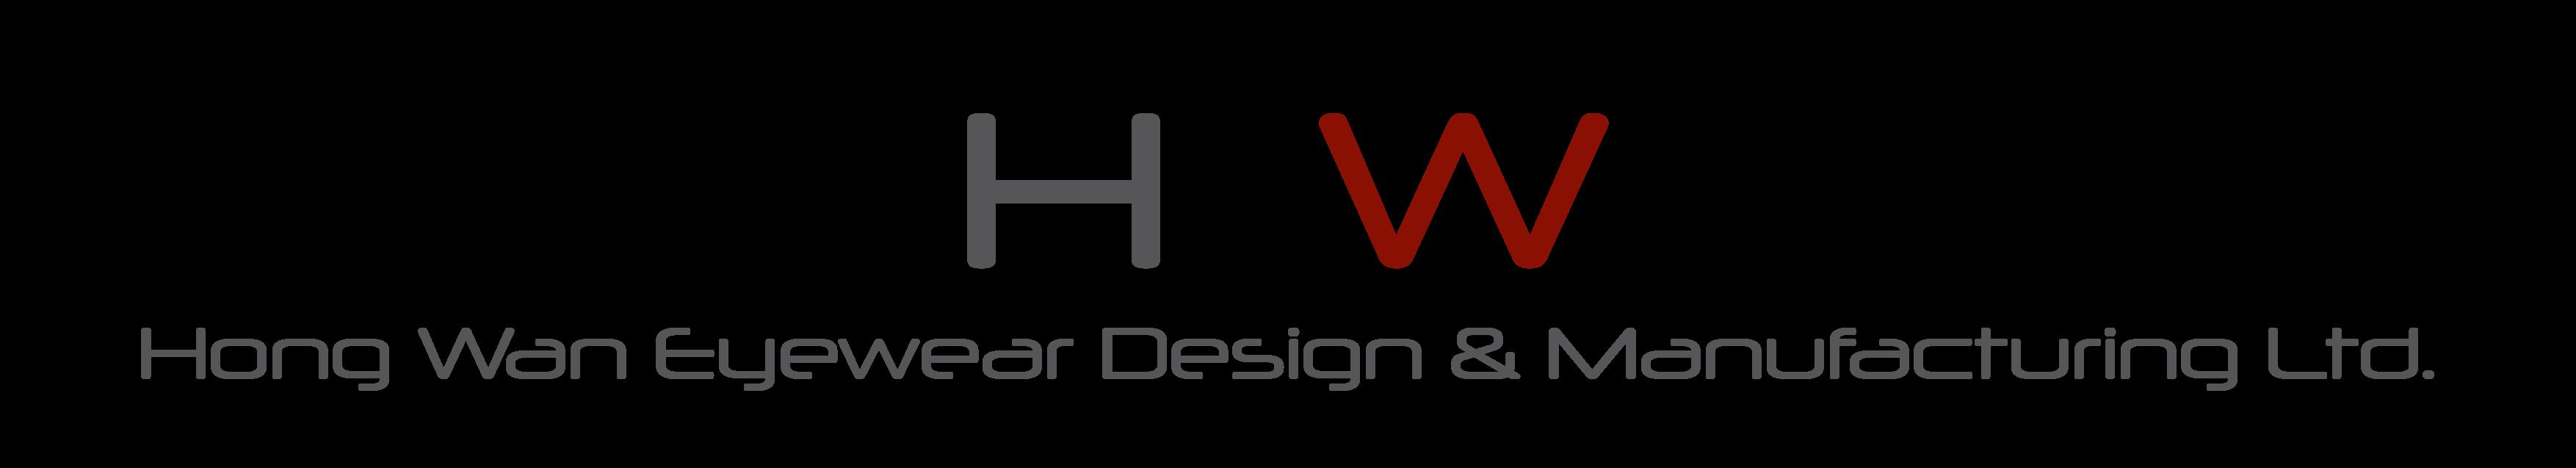 logo HW eyewear